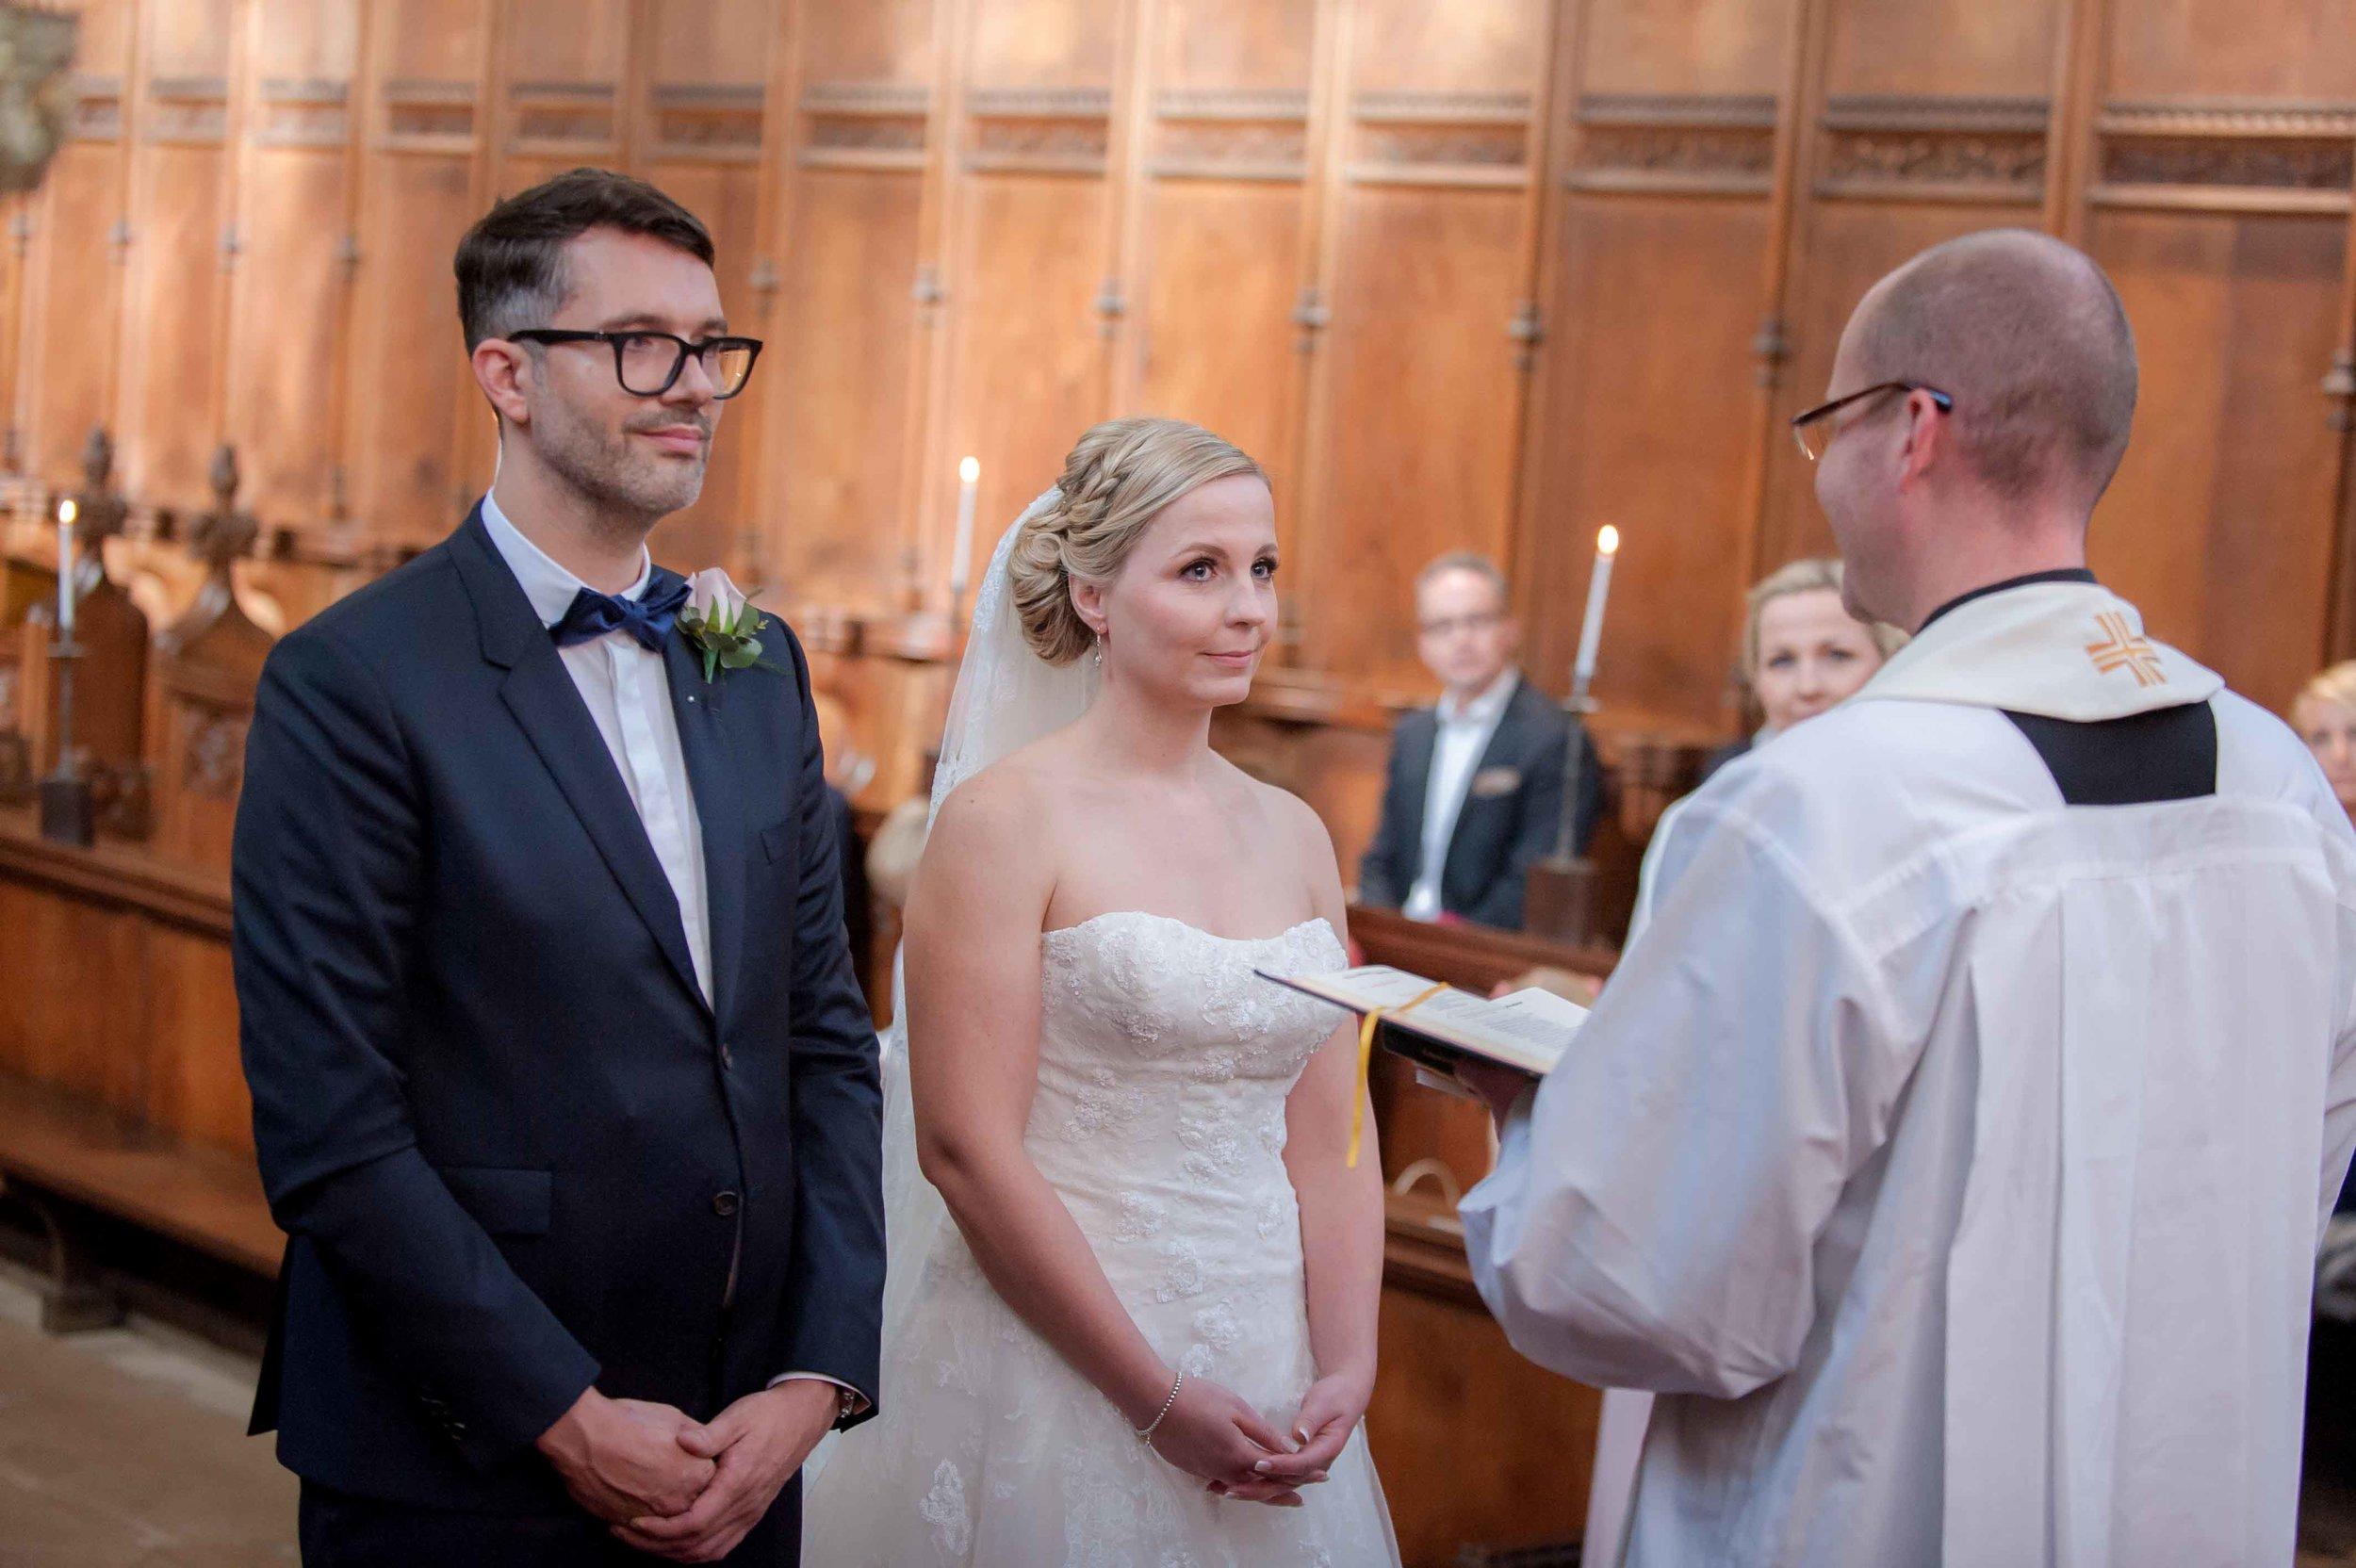 Adrian_Nicole_Charnwood_Weddings_Queens_College_Cambridge-1016.jpg